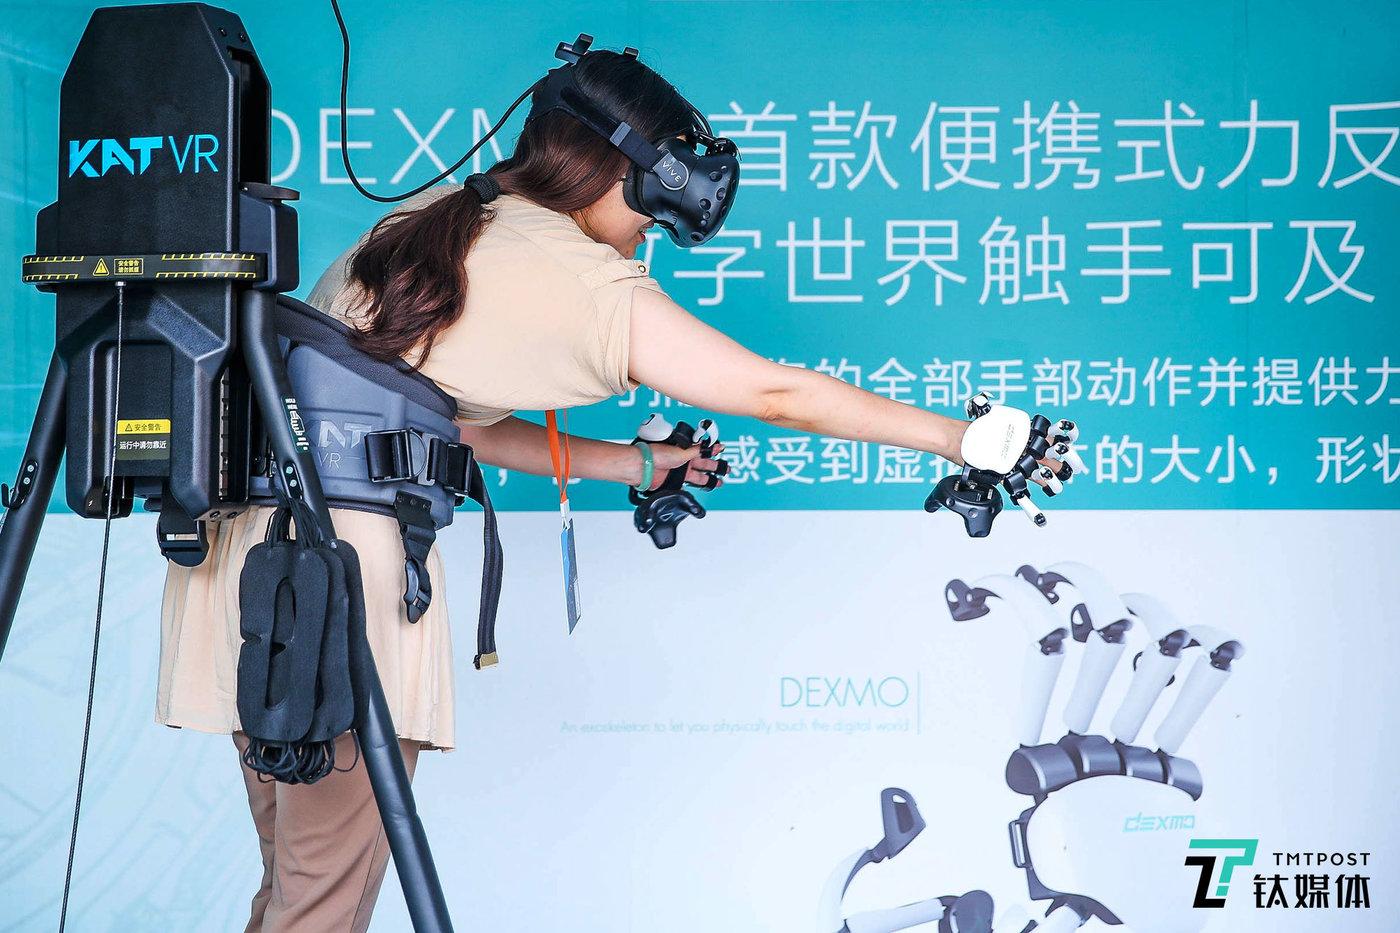 "Dexmo是一副可穿戴手部外骨骼,它可以帮用户在虚拟现实的交互中""感觉""到虚拟物体的体积、形状、硬度以及力的反馈,增加用户在虚拟现实中的沉浸感。"